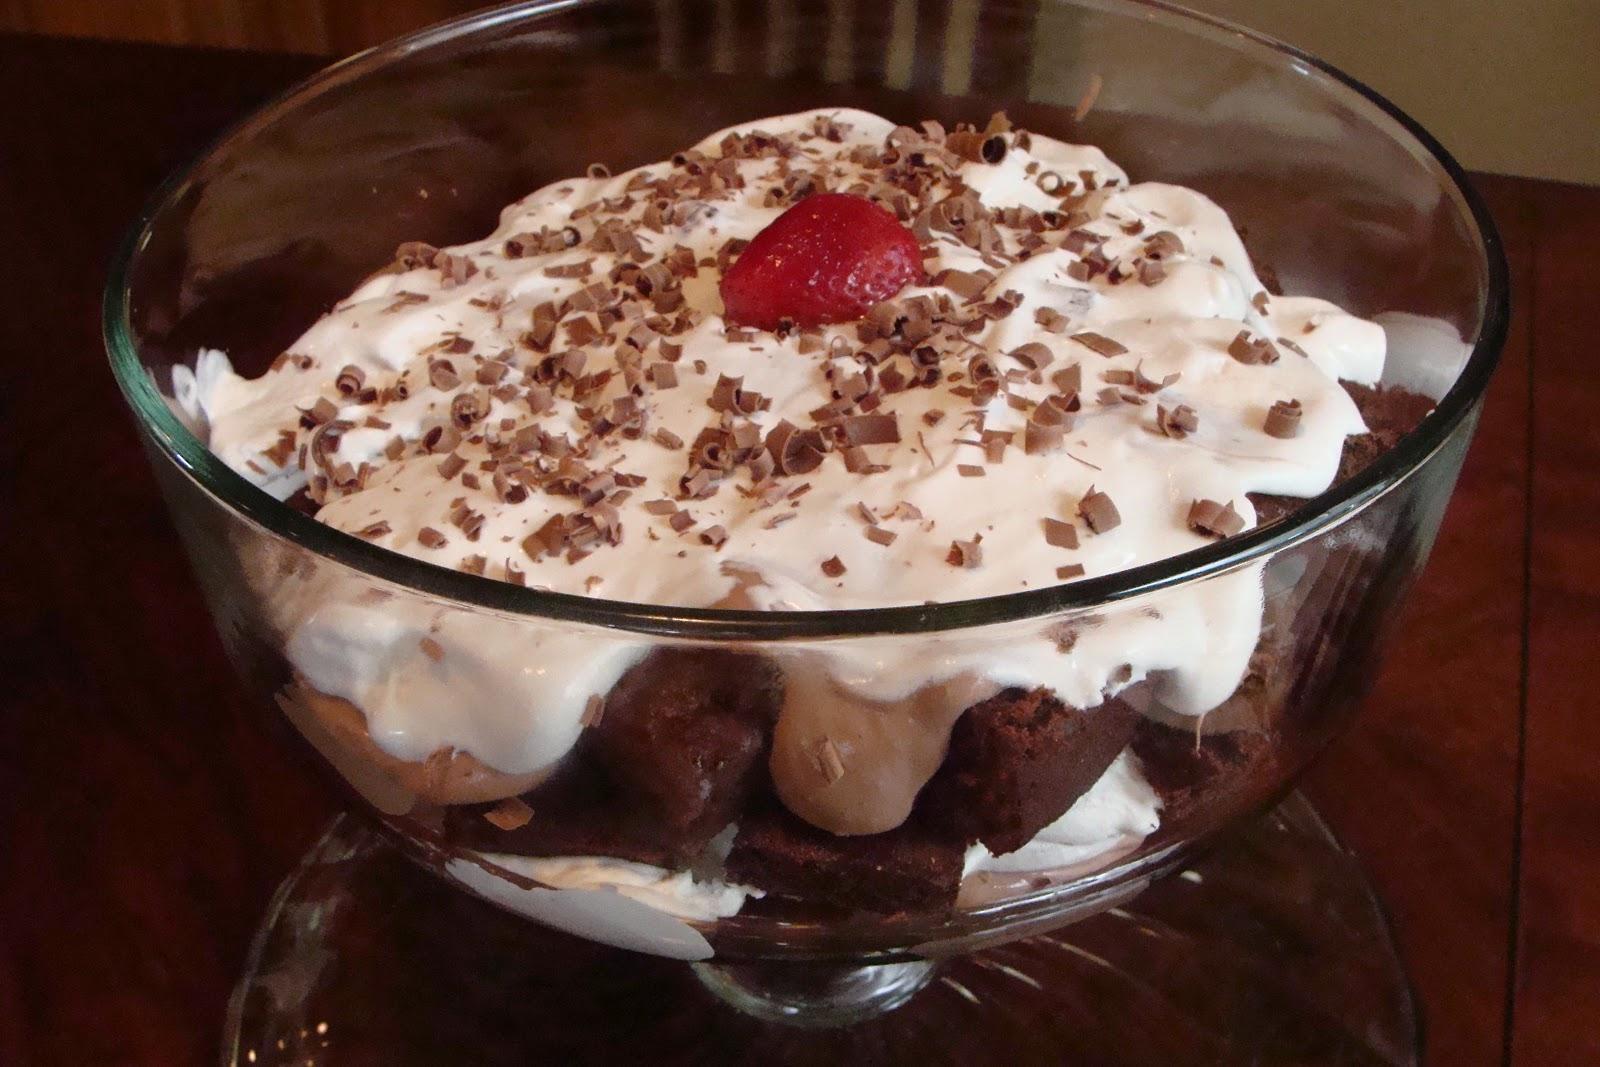 Inside Heather's Home: Skinny Chocolate Trifle